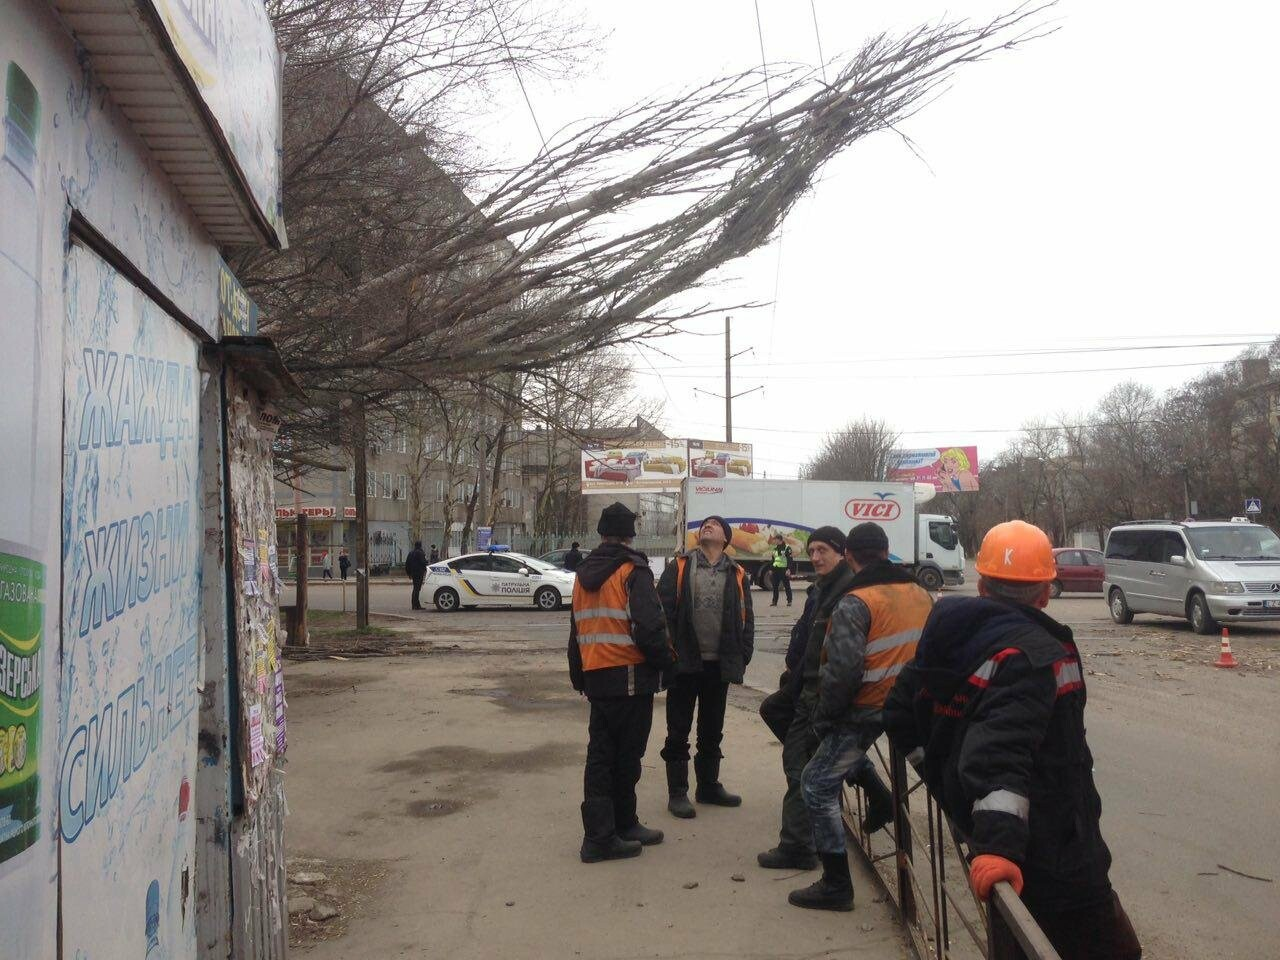 В Николаеве из-за сильного ветра дерево упало на дорогу и задело провода, - ФОТО, фото-2